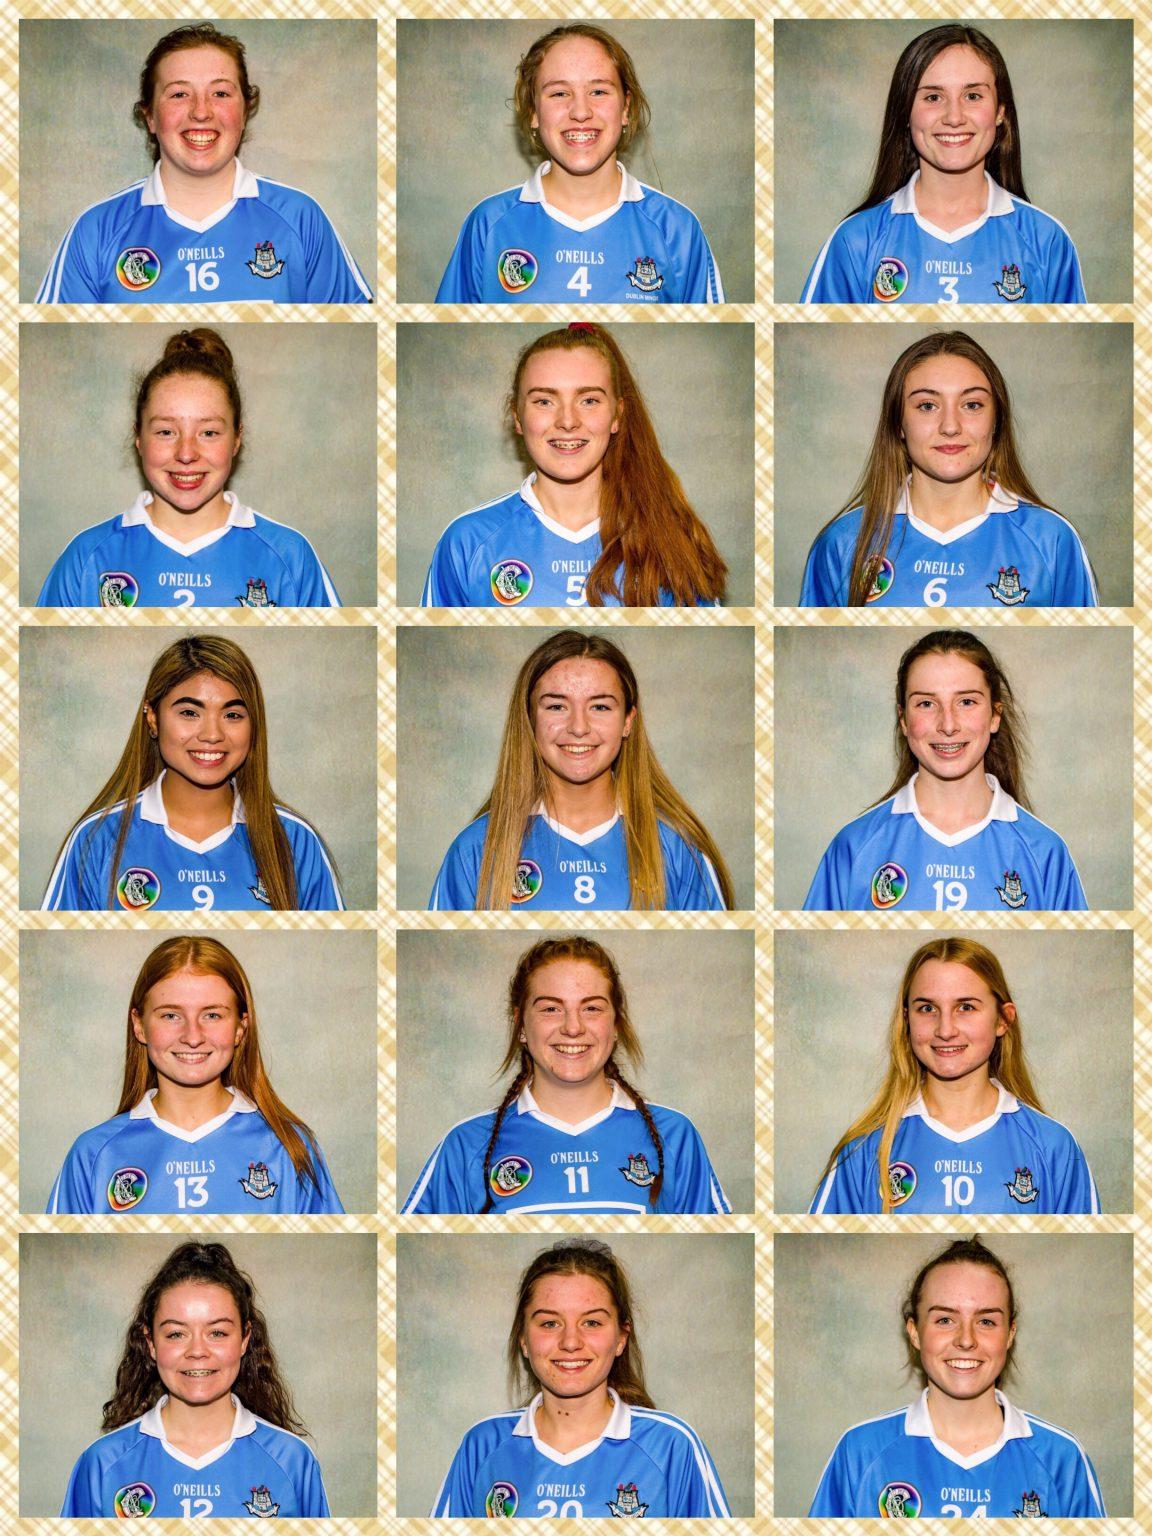 Head shots of the Dublin Camogie Minor Team